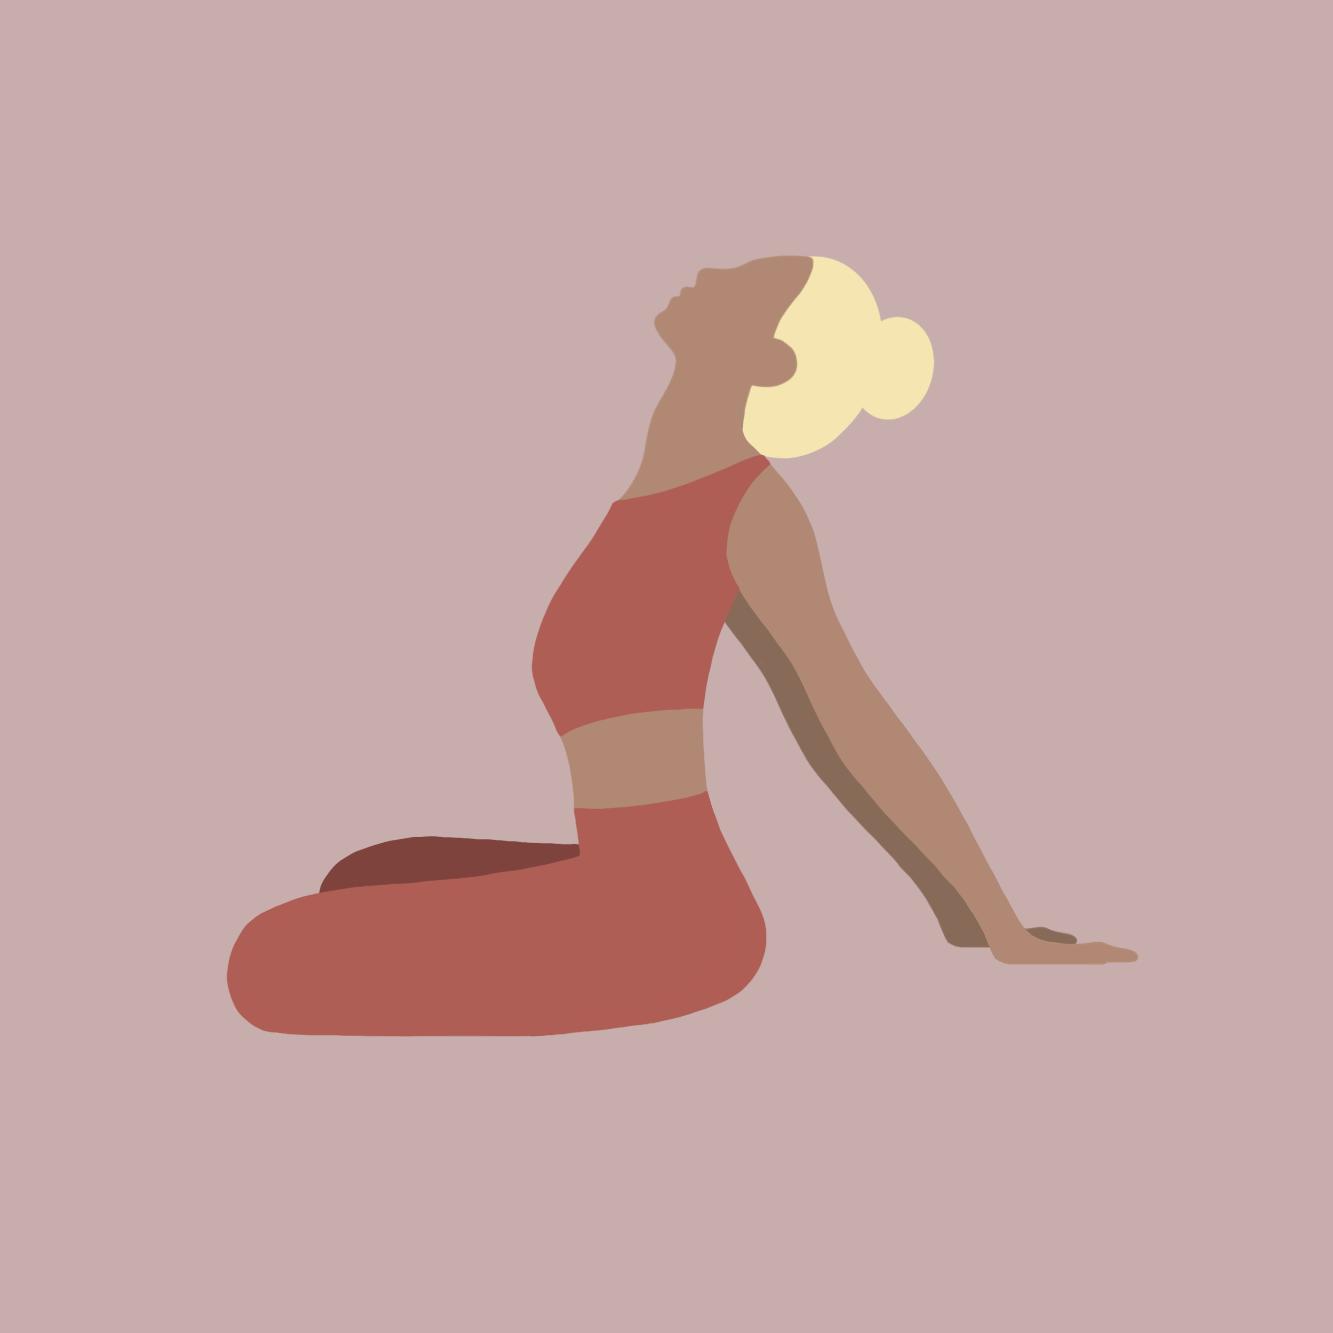 Illustration Yoga-Übung Nackenübung1